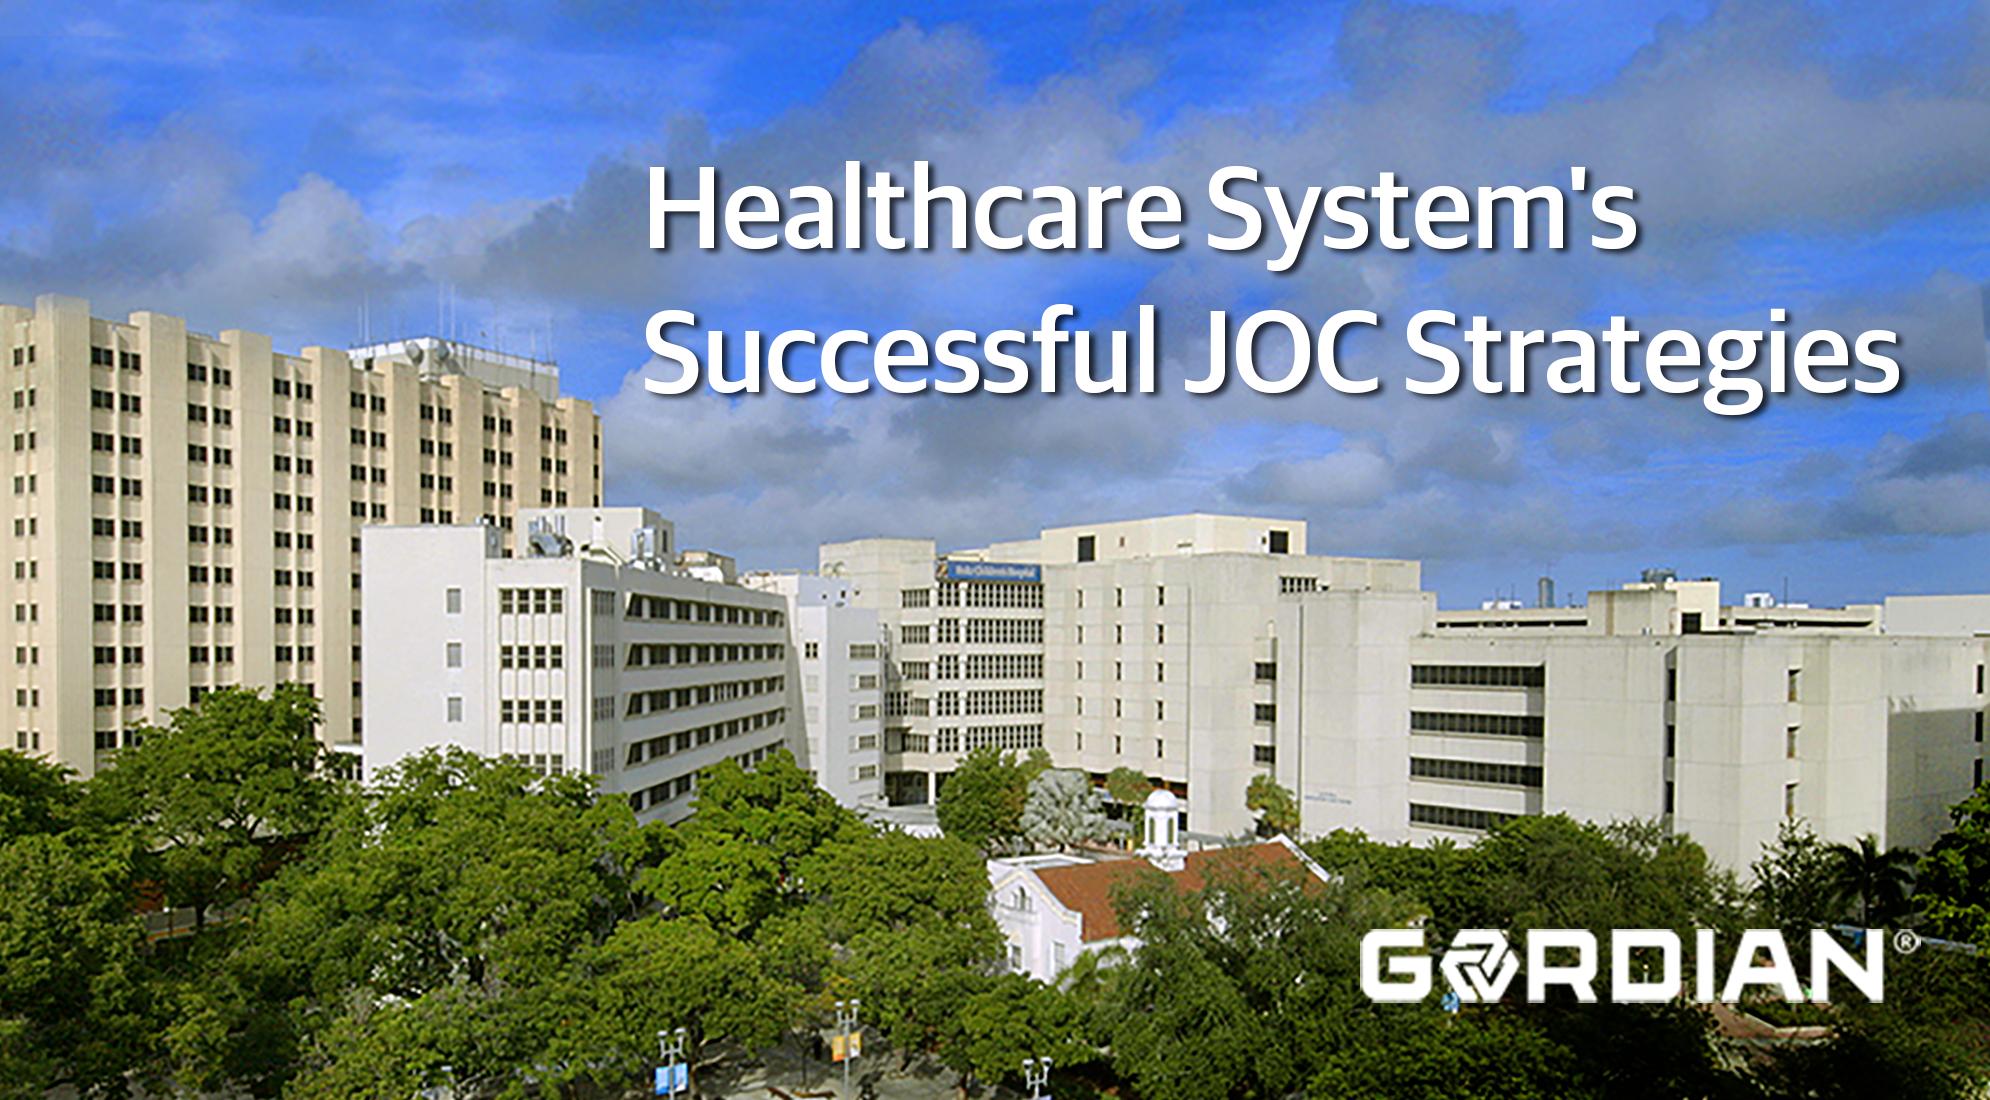 Healthcare System's Successful JOC Strategies